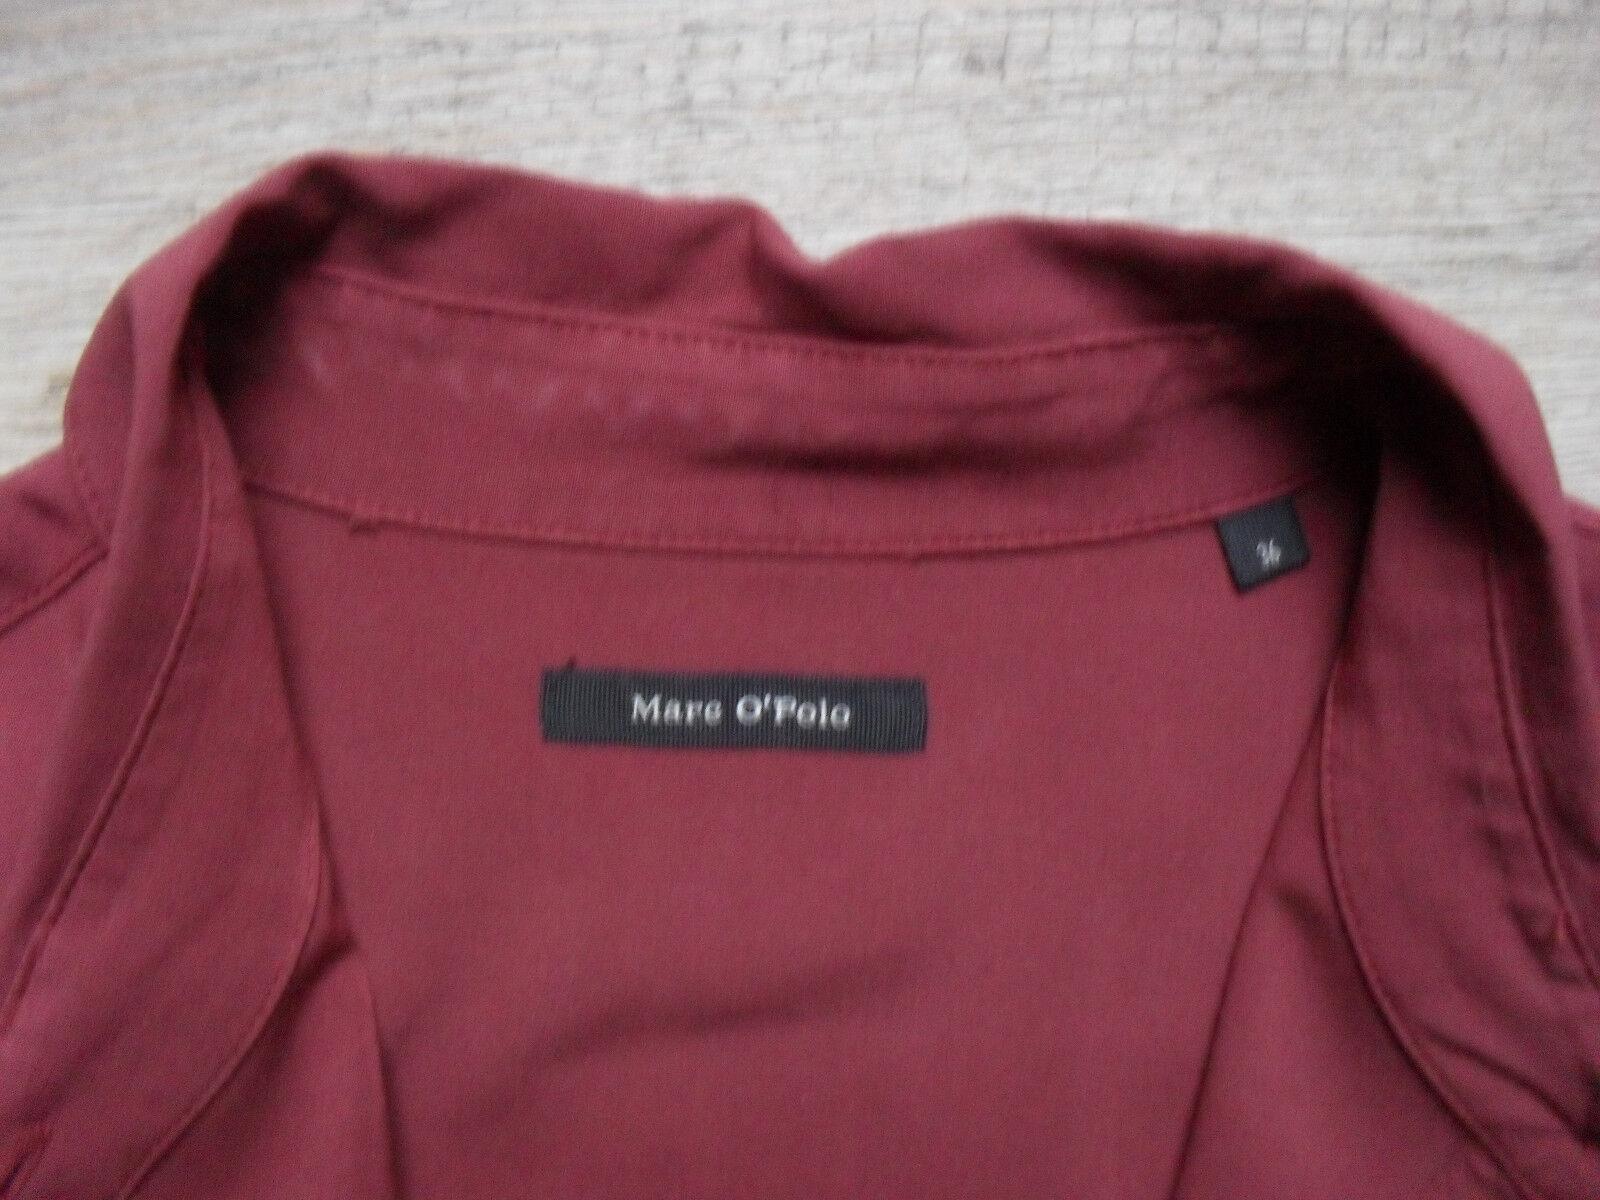 Marc O'Polo Blause Gr. 36 36 36    | Online Store  | Qualitätsprodukte  | Haltbarkeit  | Online Outlet Store  | Tadellos  c3b43f